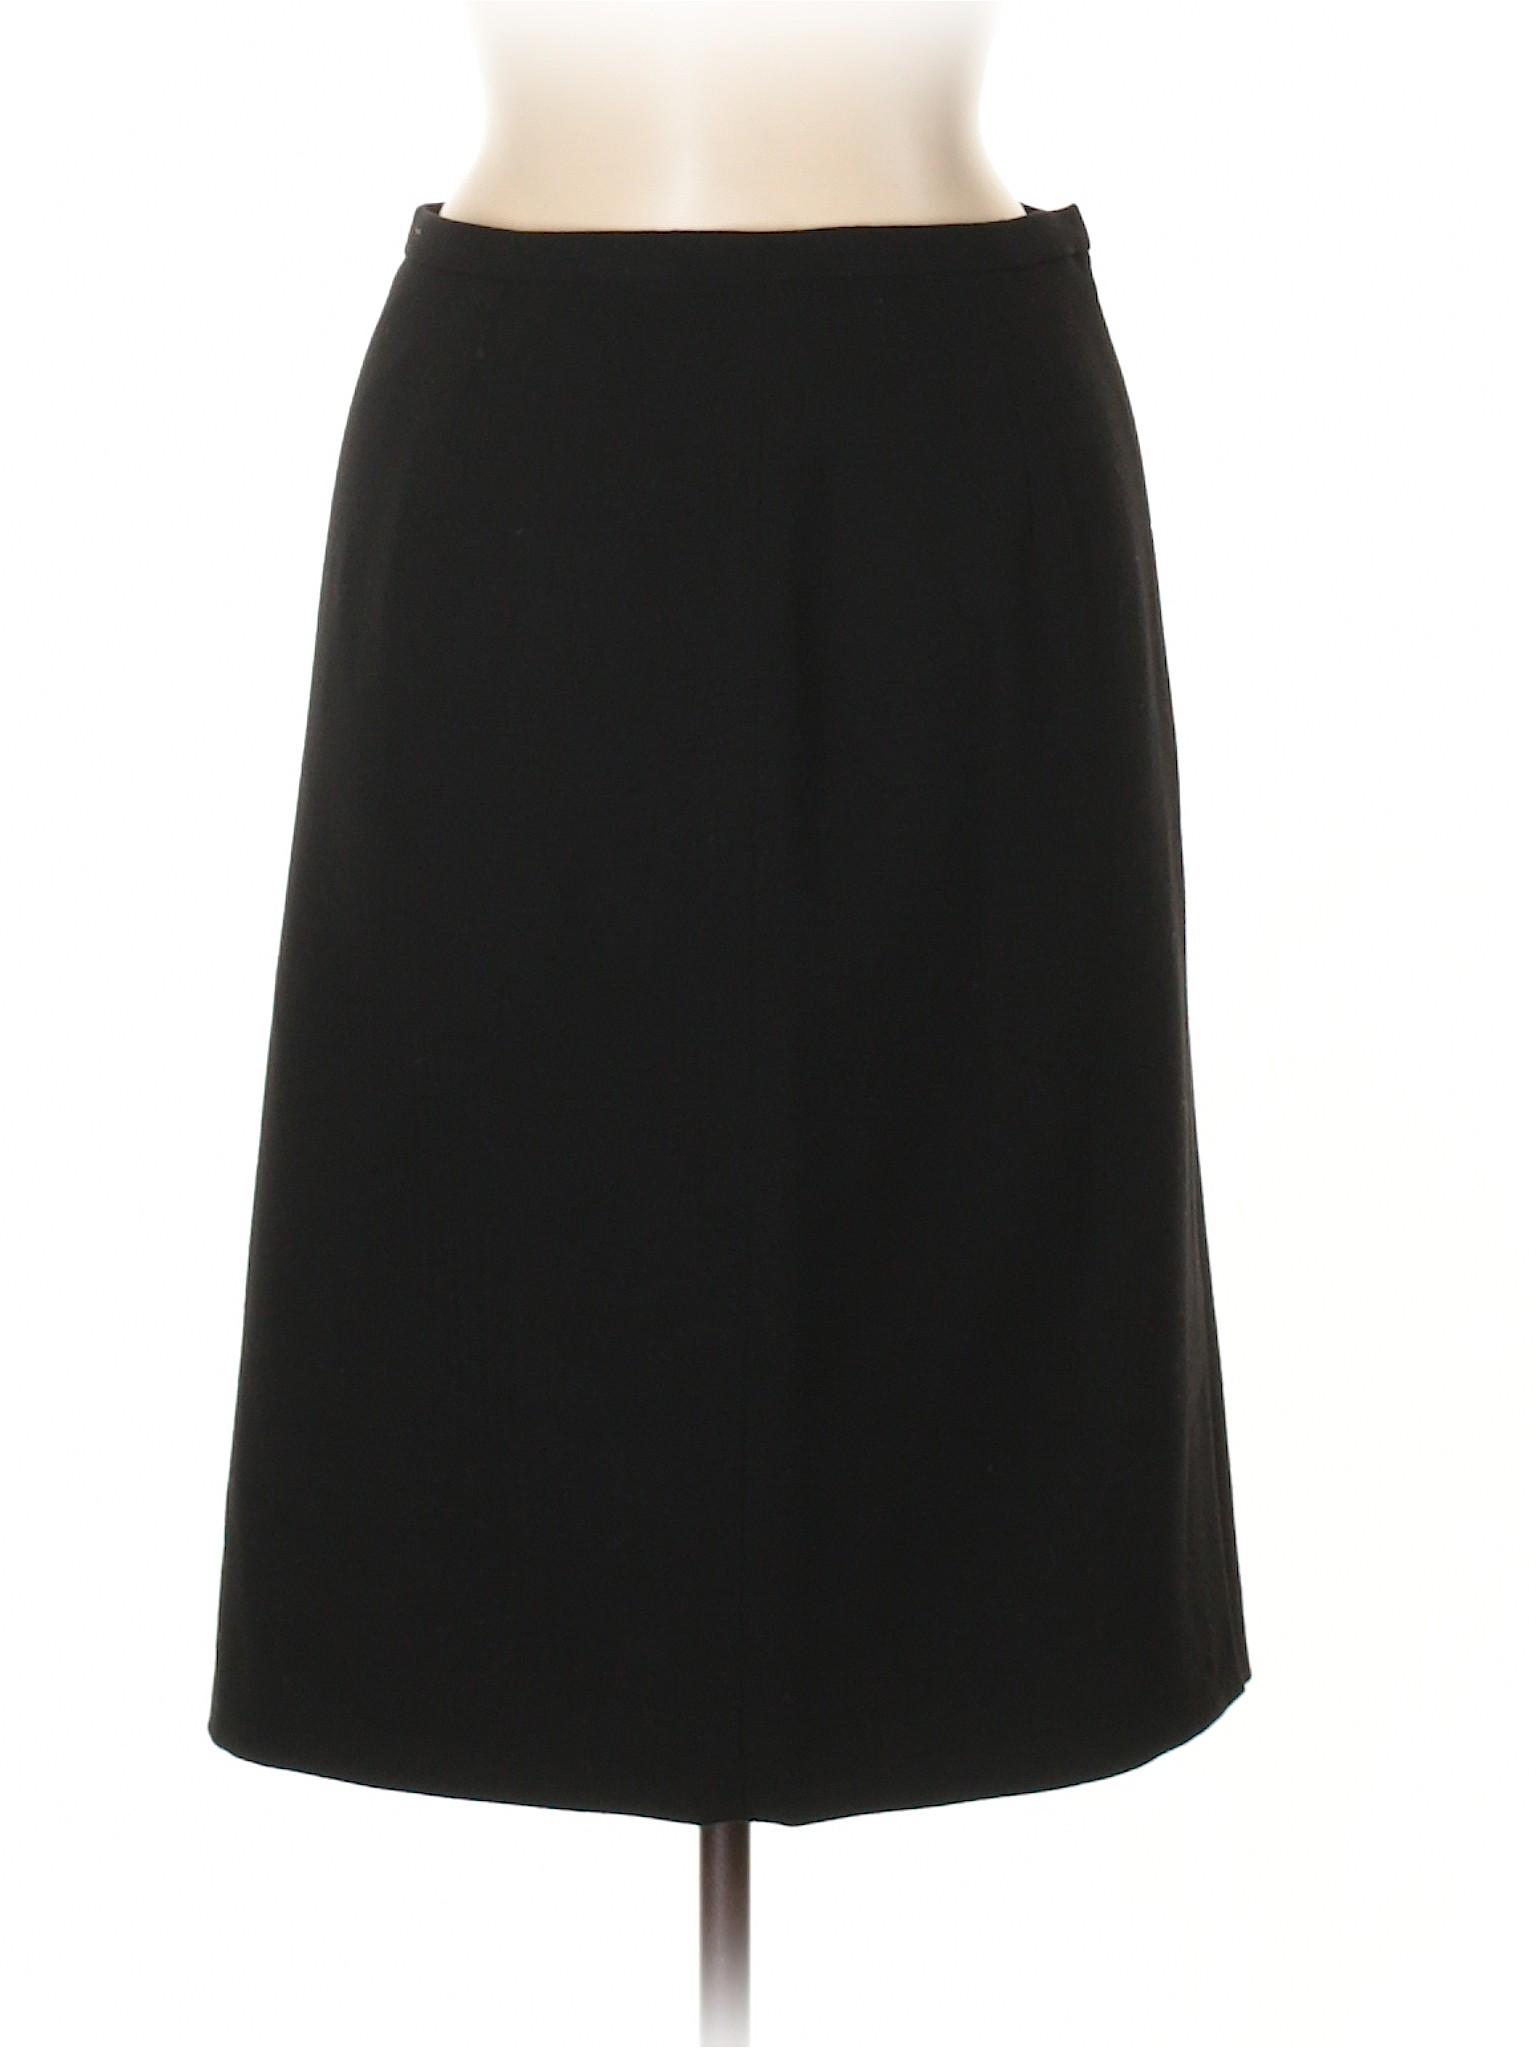 Boutique Skirt Boutique Skirt Casual Casual Skirt Boutique Skirt Casual Casual Boutique 08nSxwqA